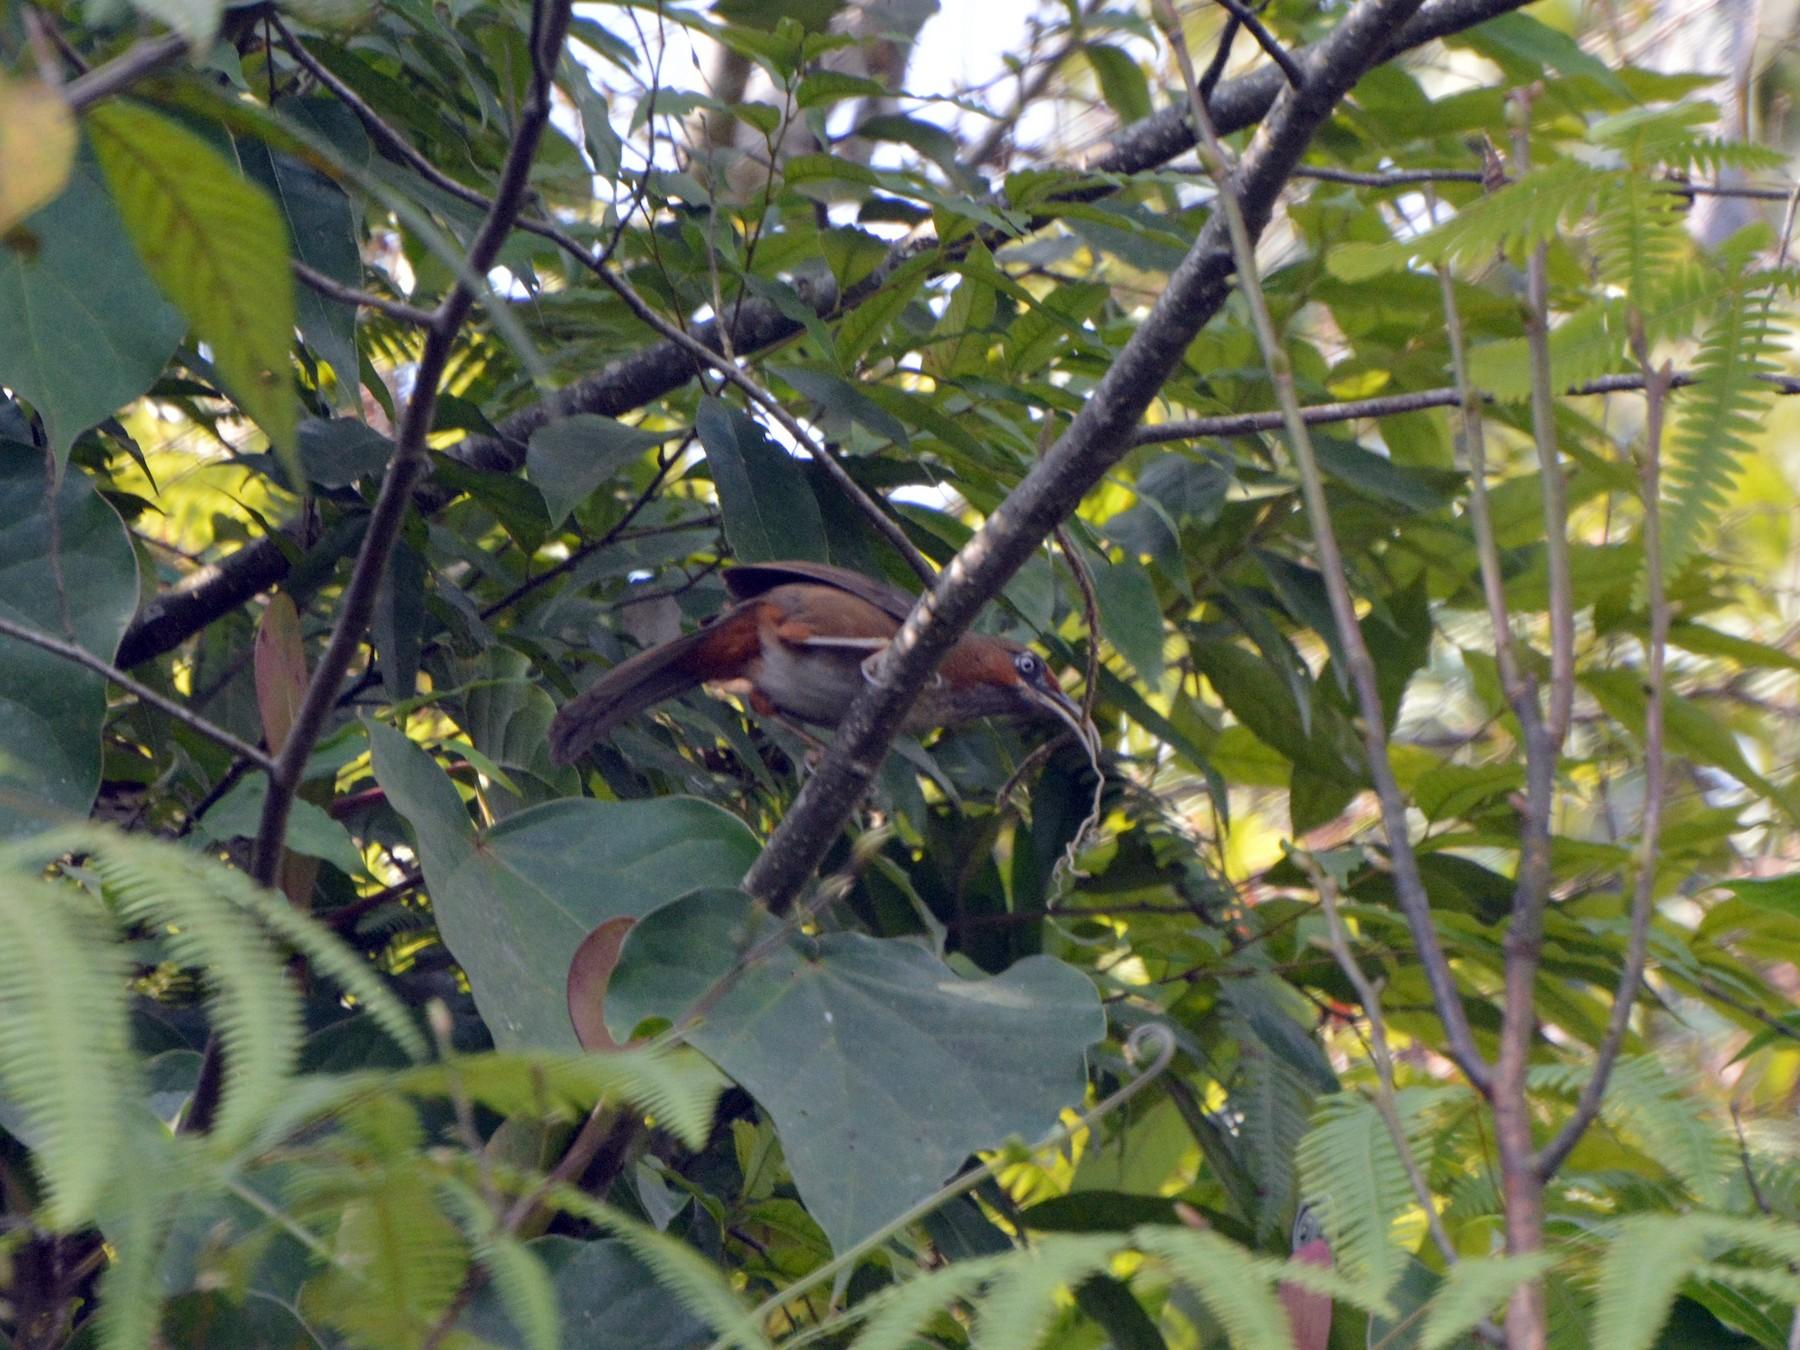 Rusty-cheeked Scimitar-Babbler - Biswanath Mondal